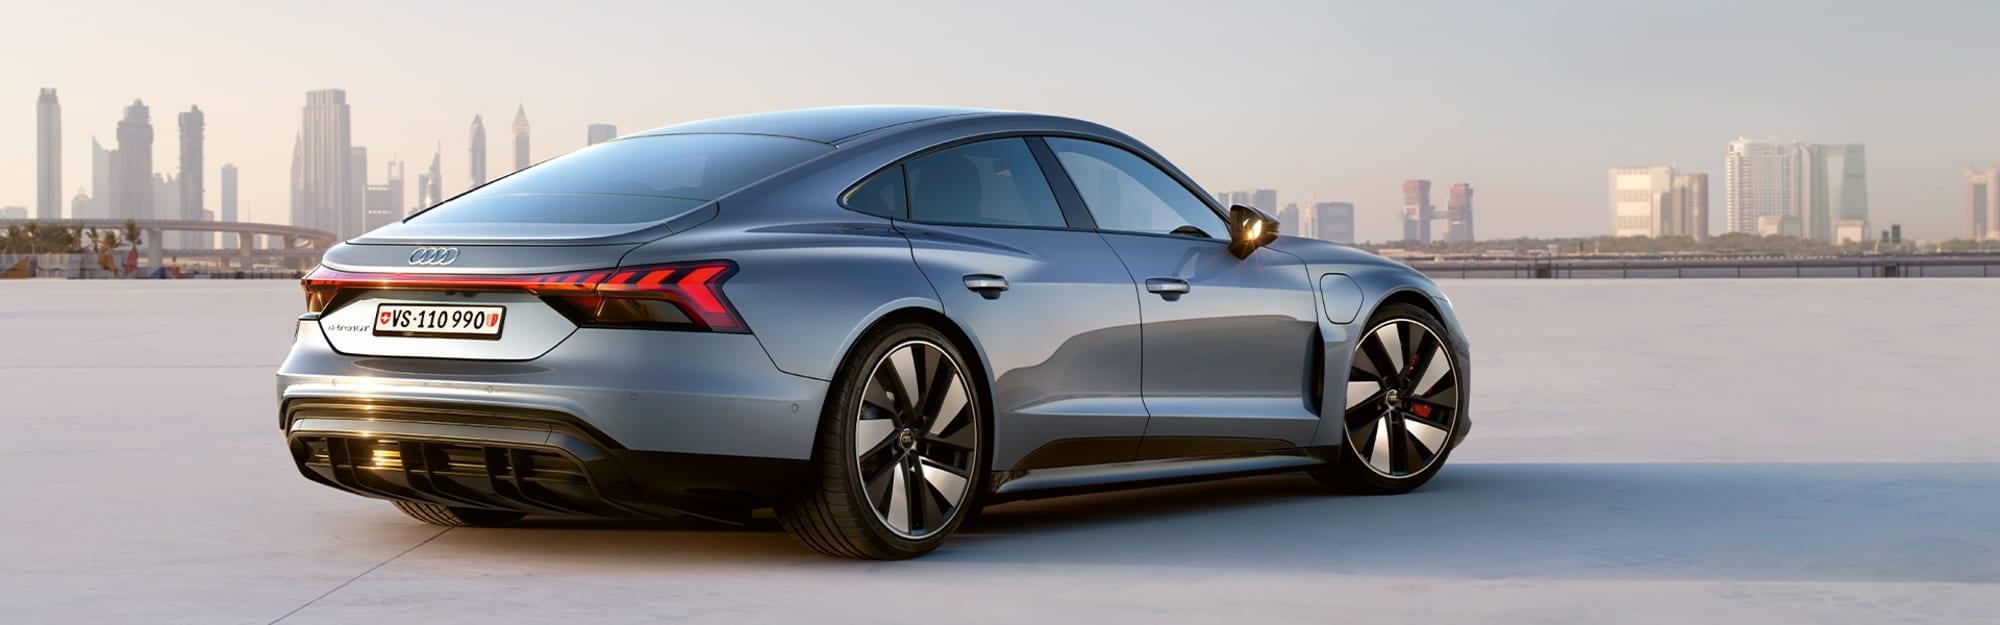 Audi_etronGT_Haendlerwebseite_1920x600px_f